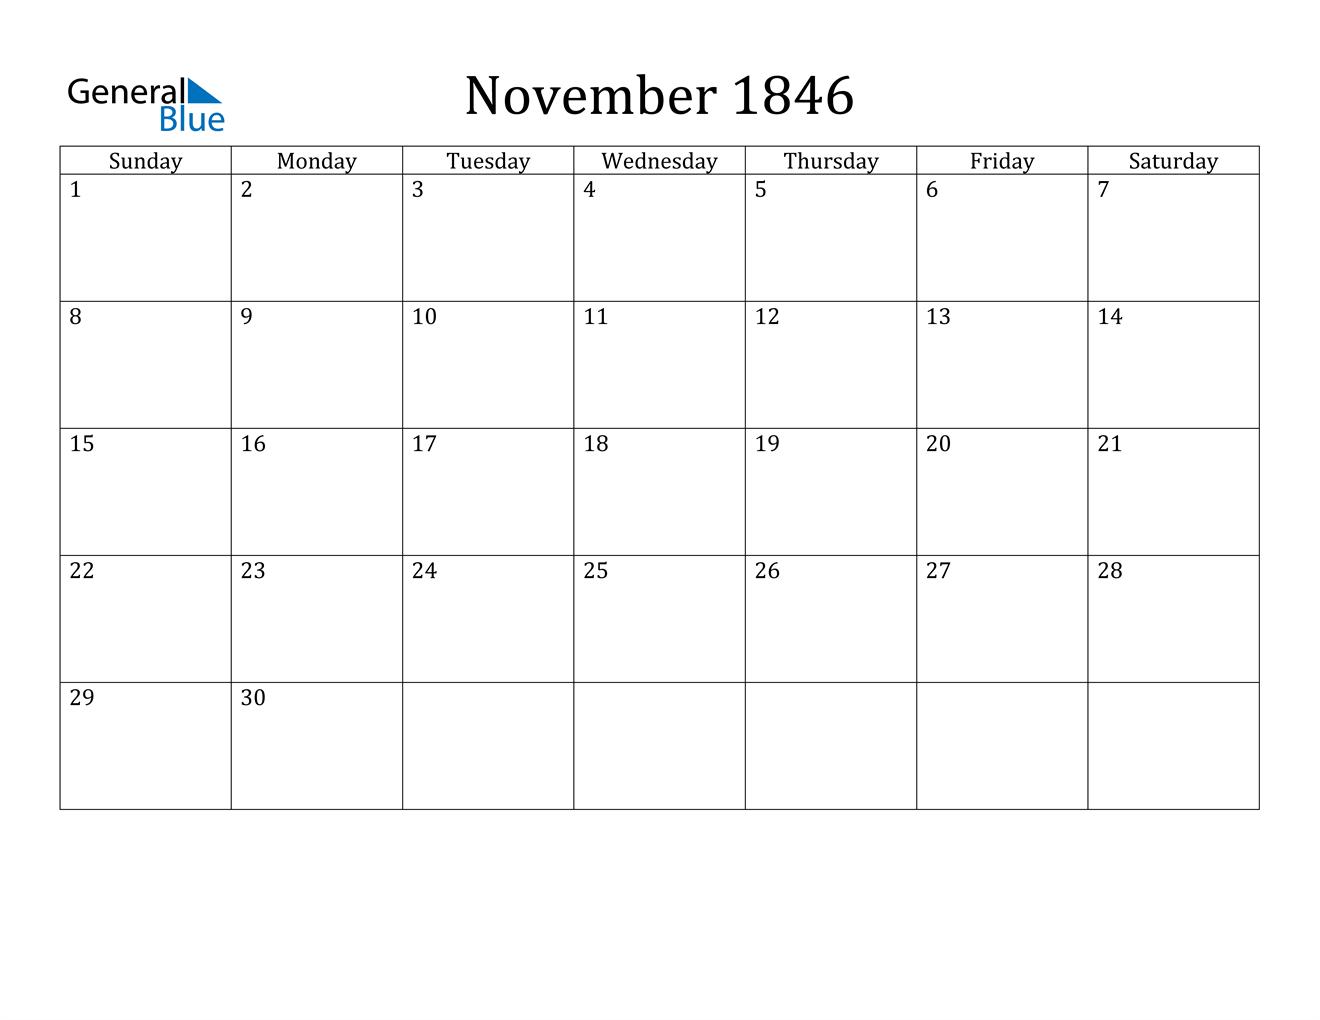 Image of November 1846 Calendar